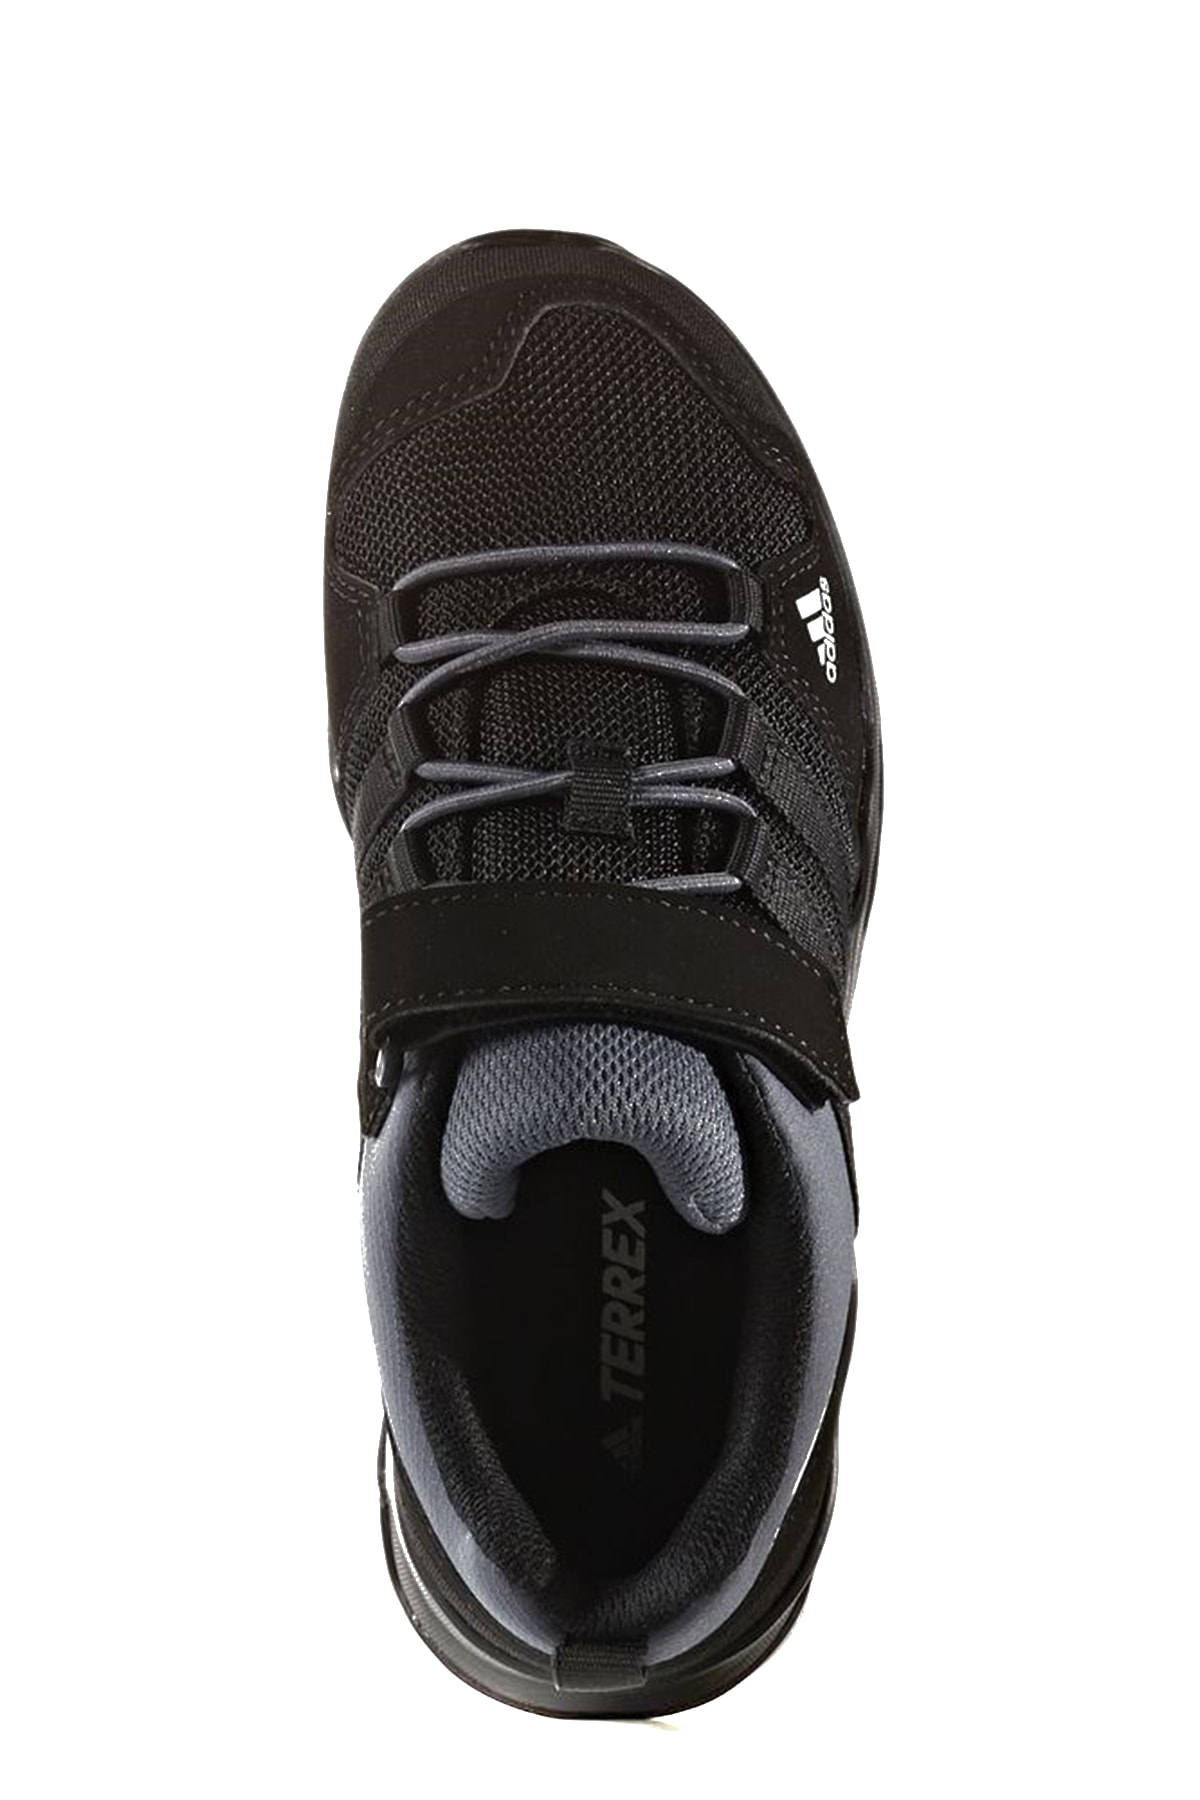 adidas Çocuk Terrex Ax2R Cf K Outdoor Ayakkabı 2